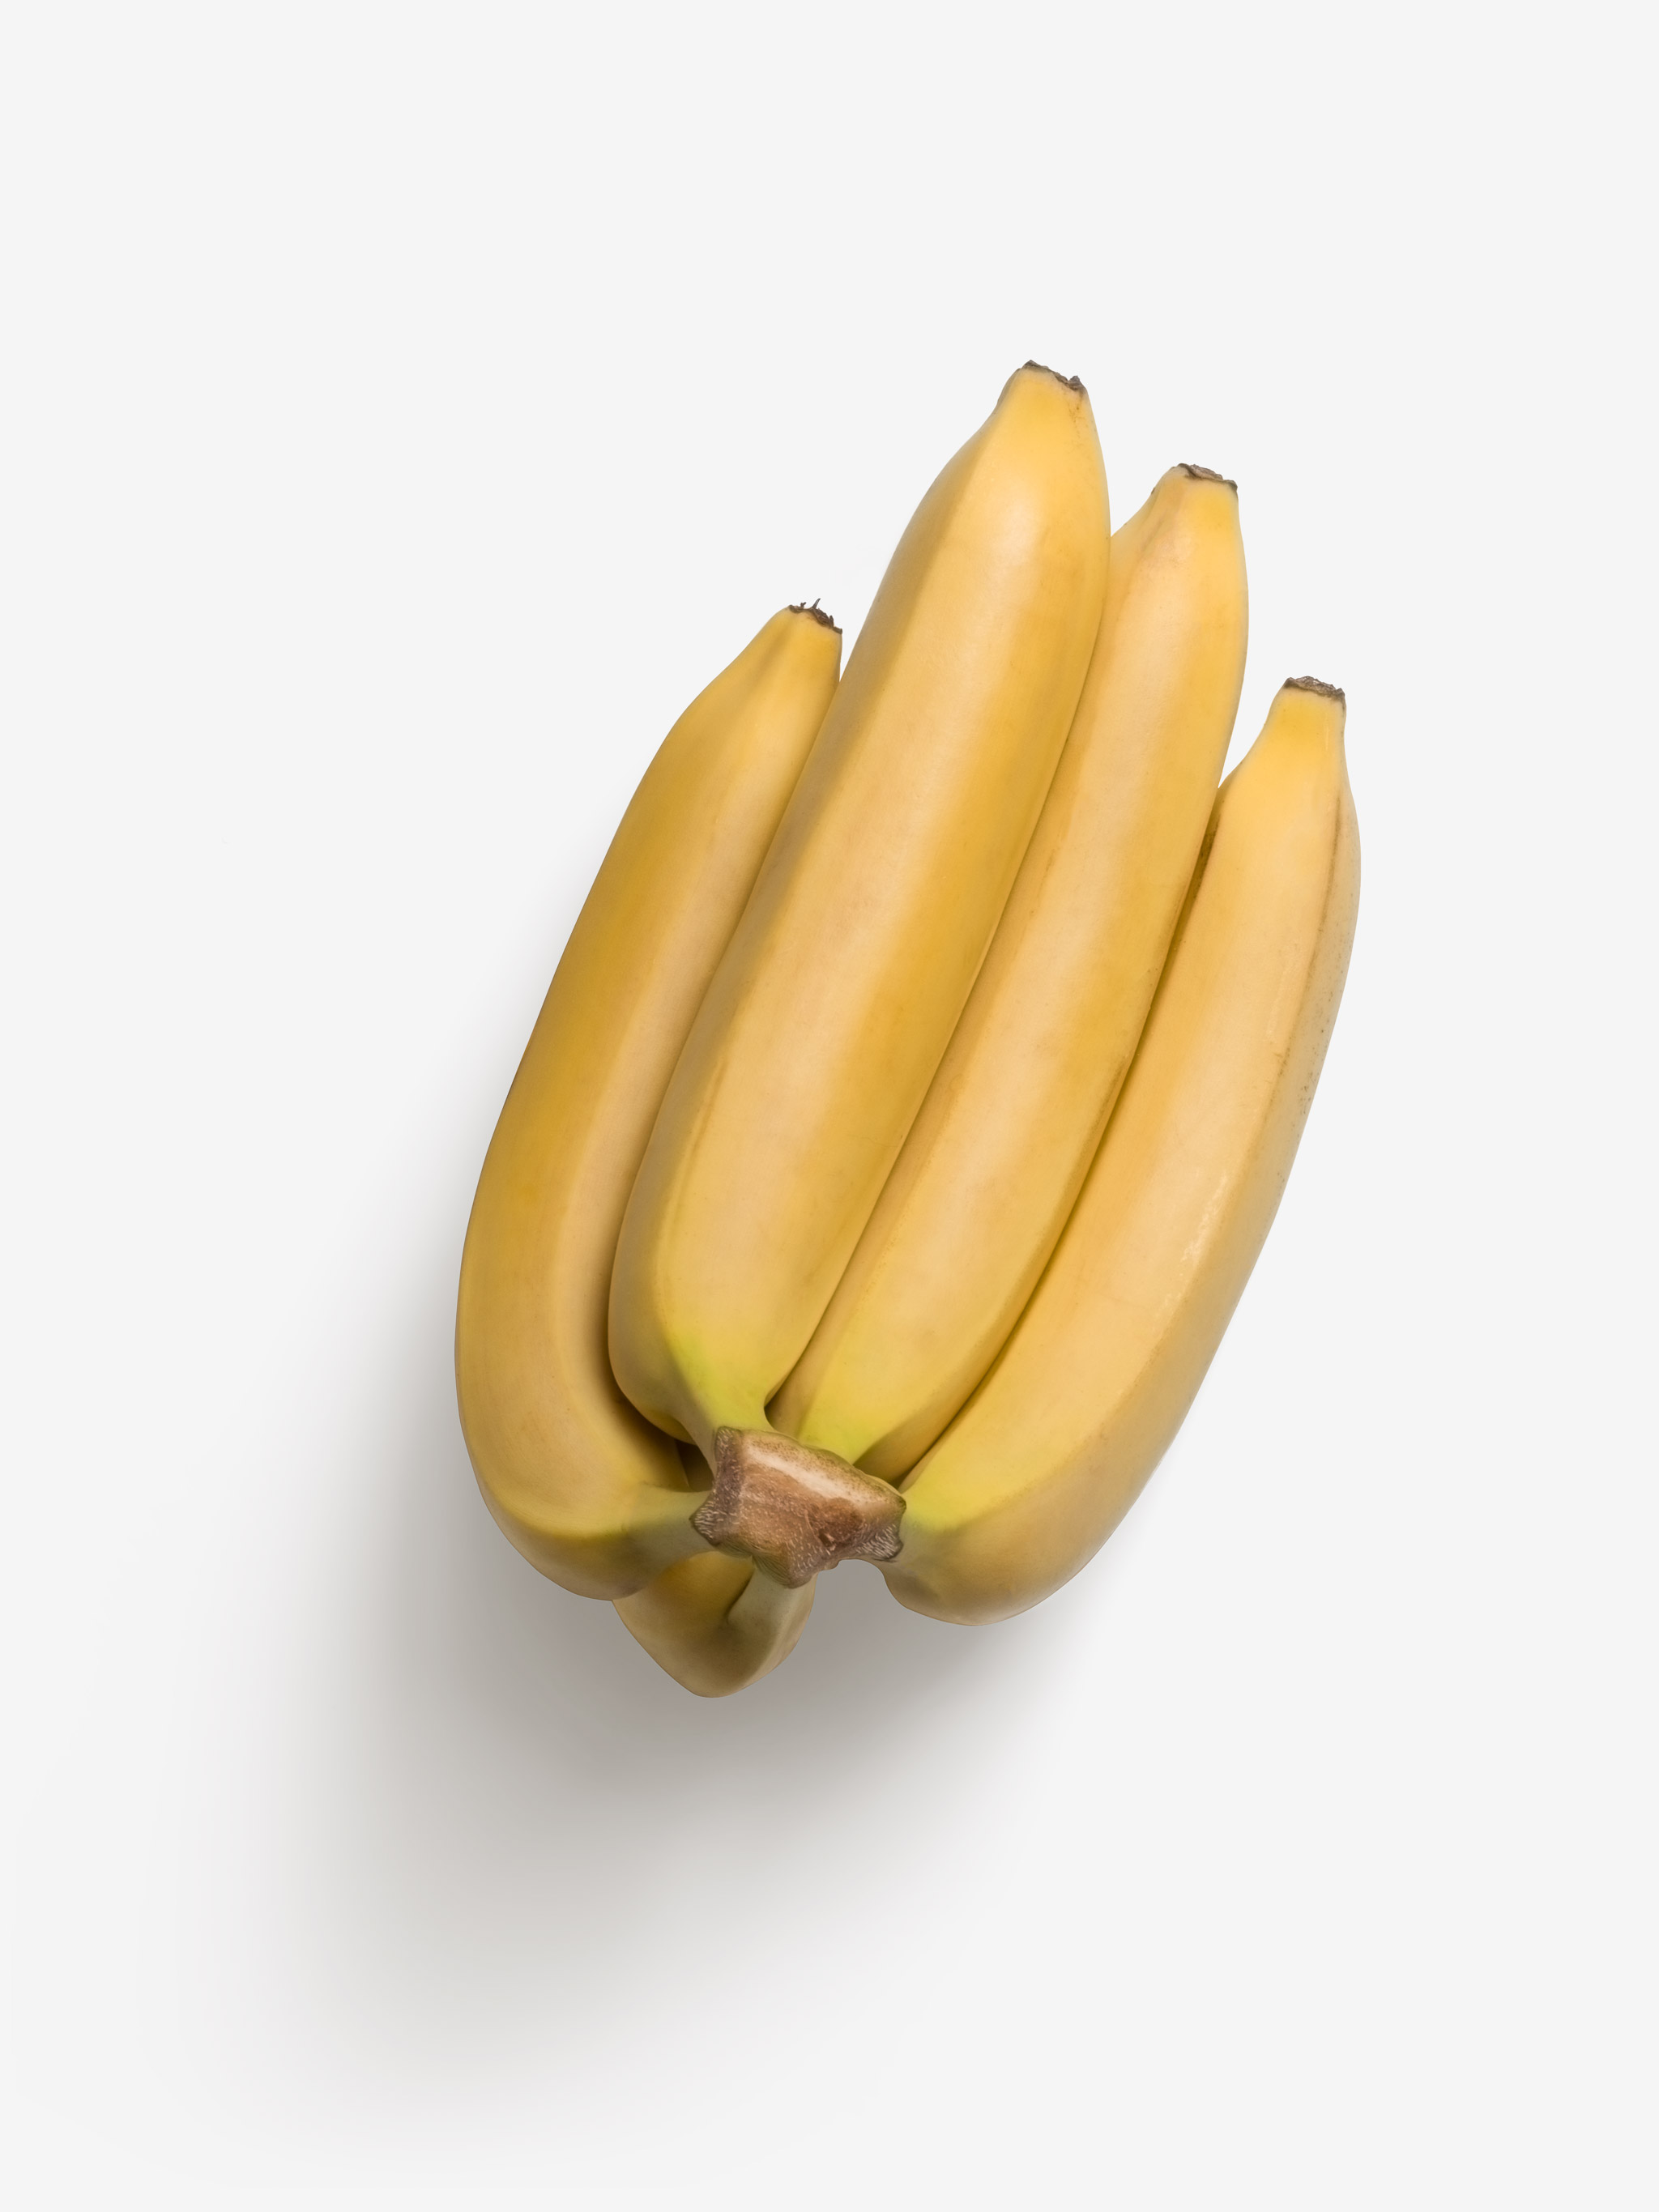 Banana image asset with transparent background